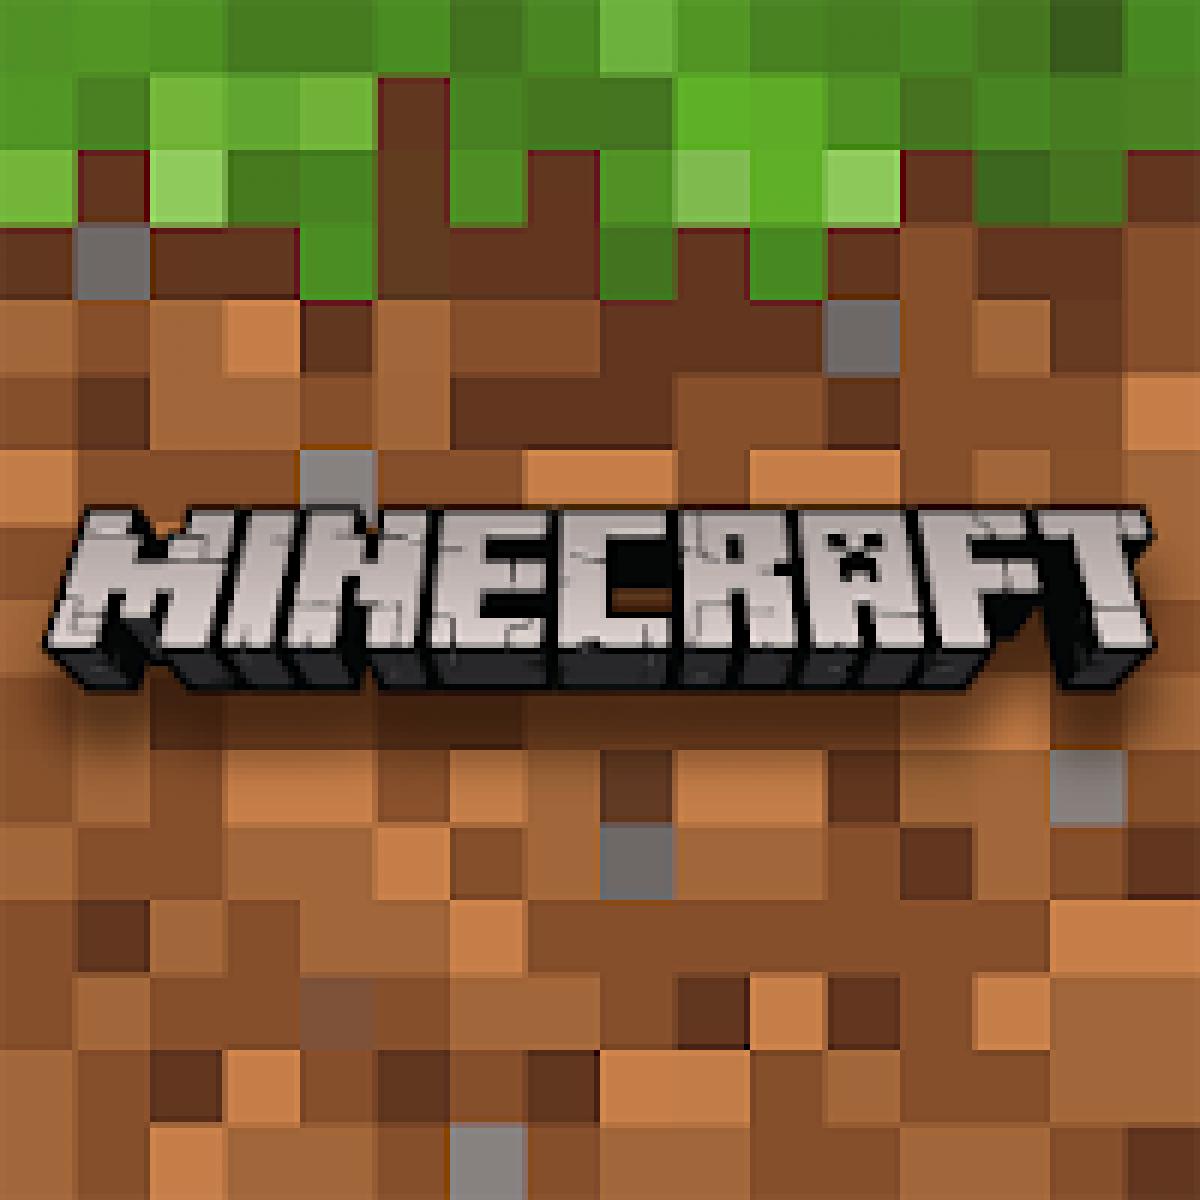 Minecraft MOD APK 8.86.280.8 Download (Immortality/Unlocked) free